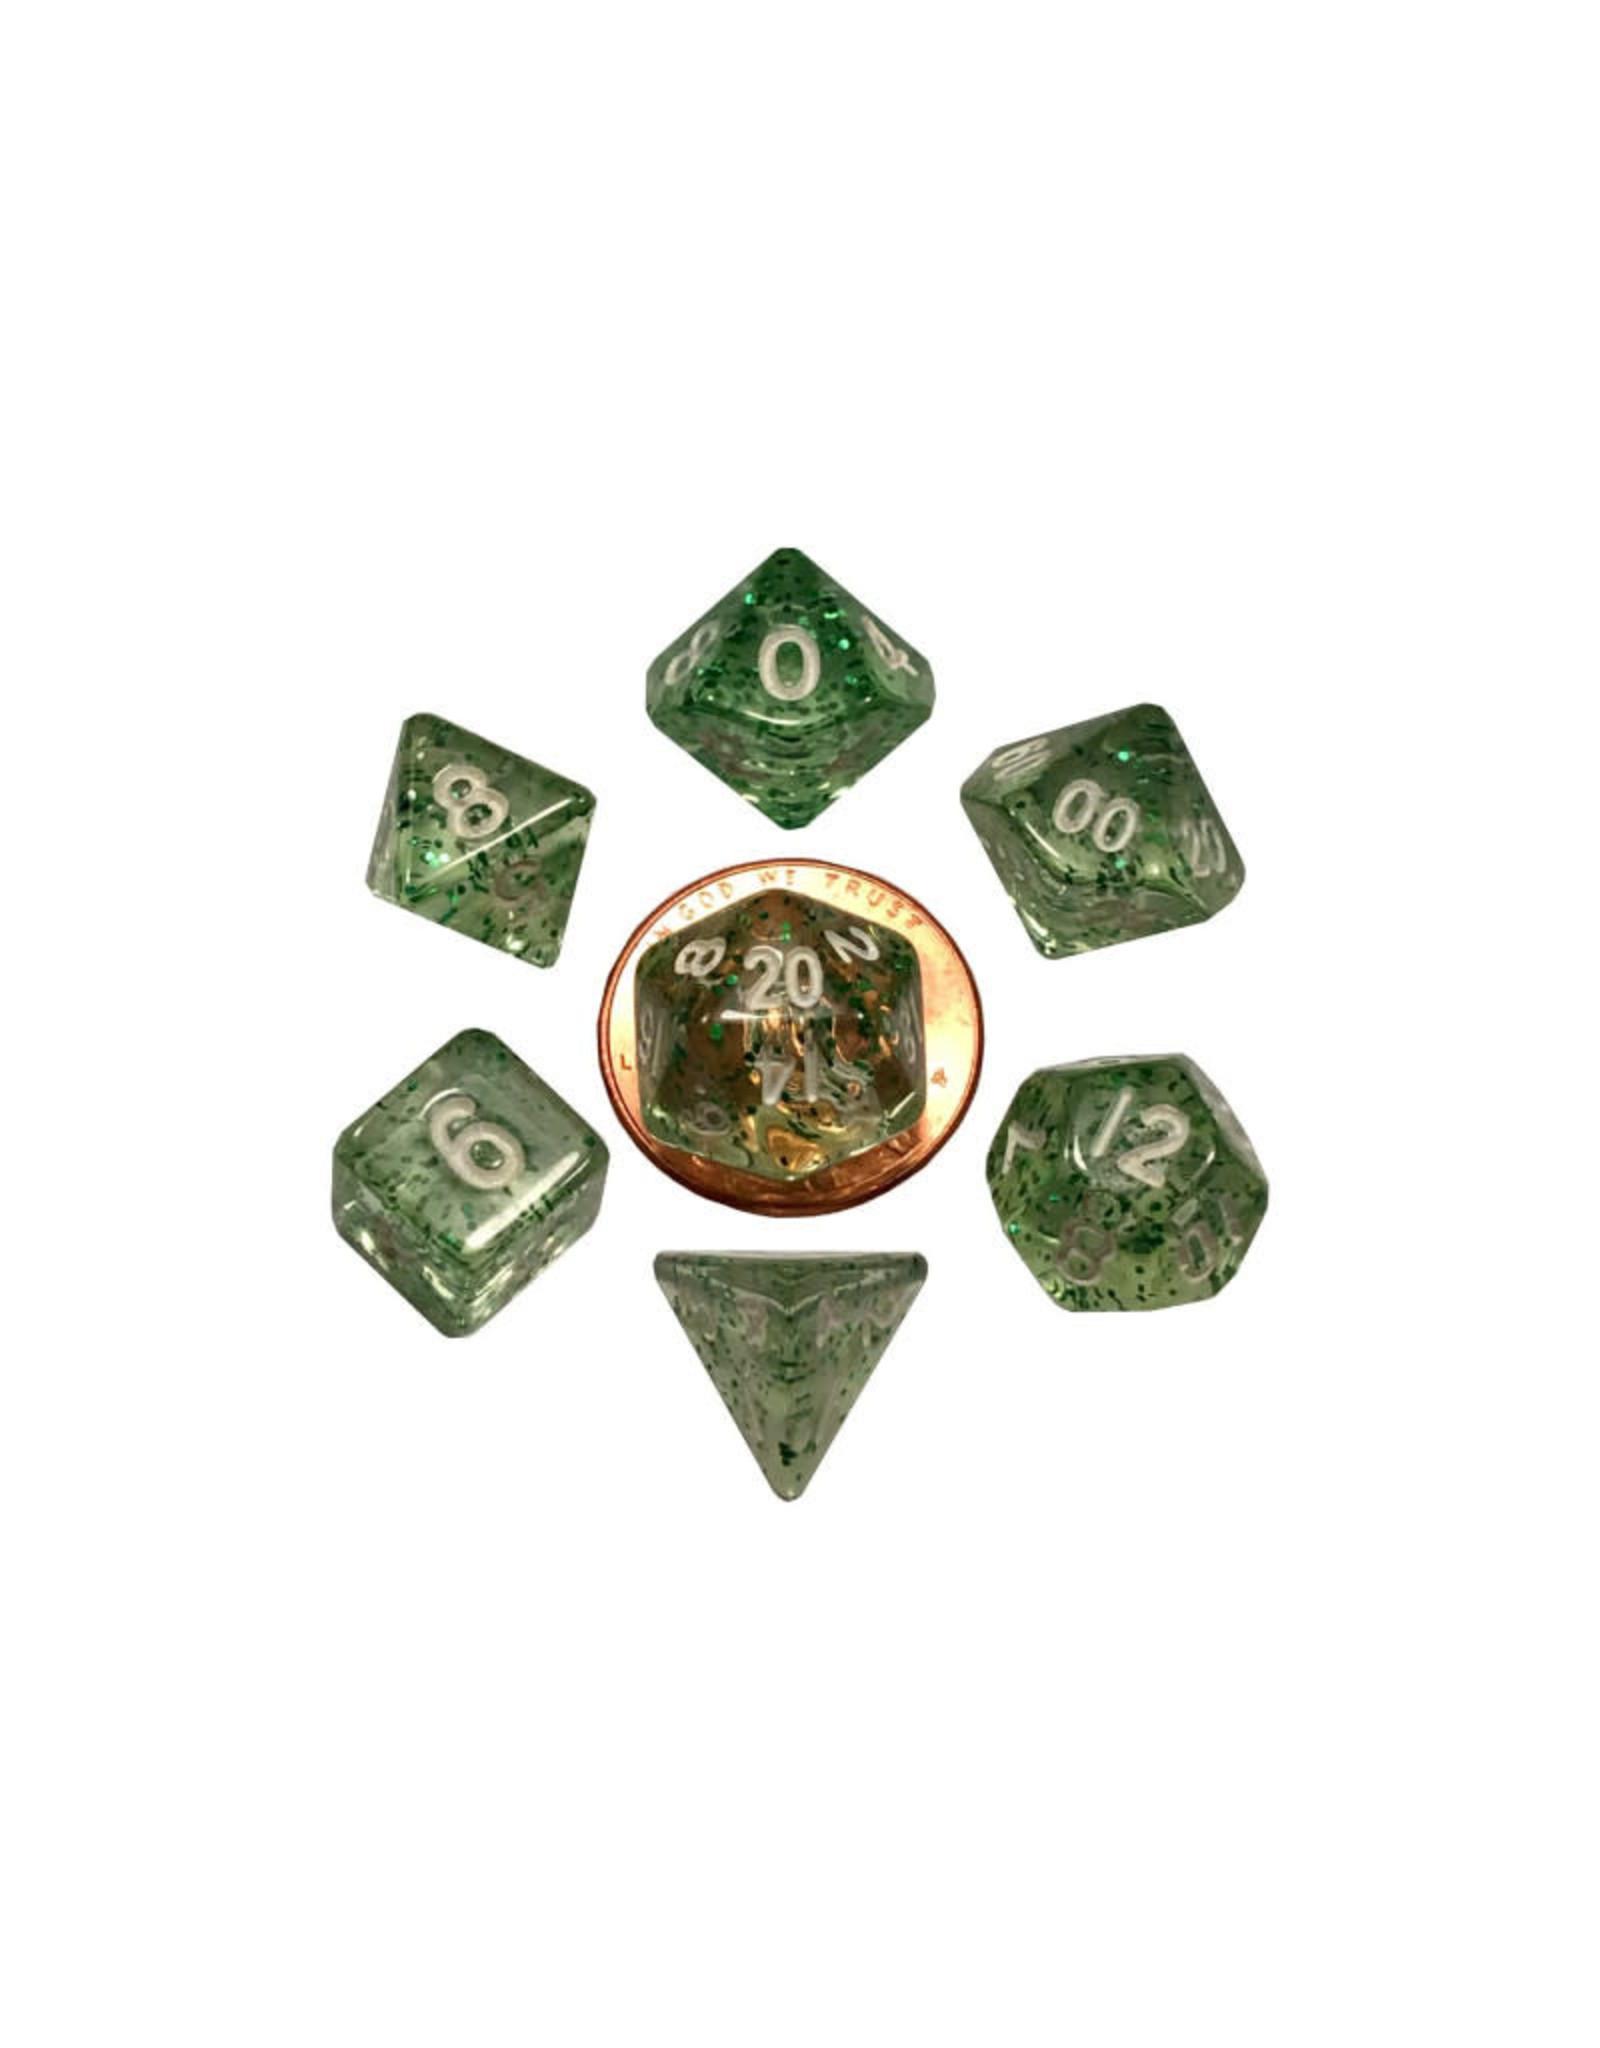 Metallic Dice Games Mini Polyhedral Dice Set: Ethereal Green